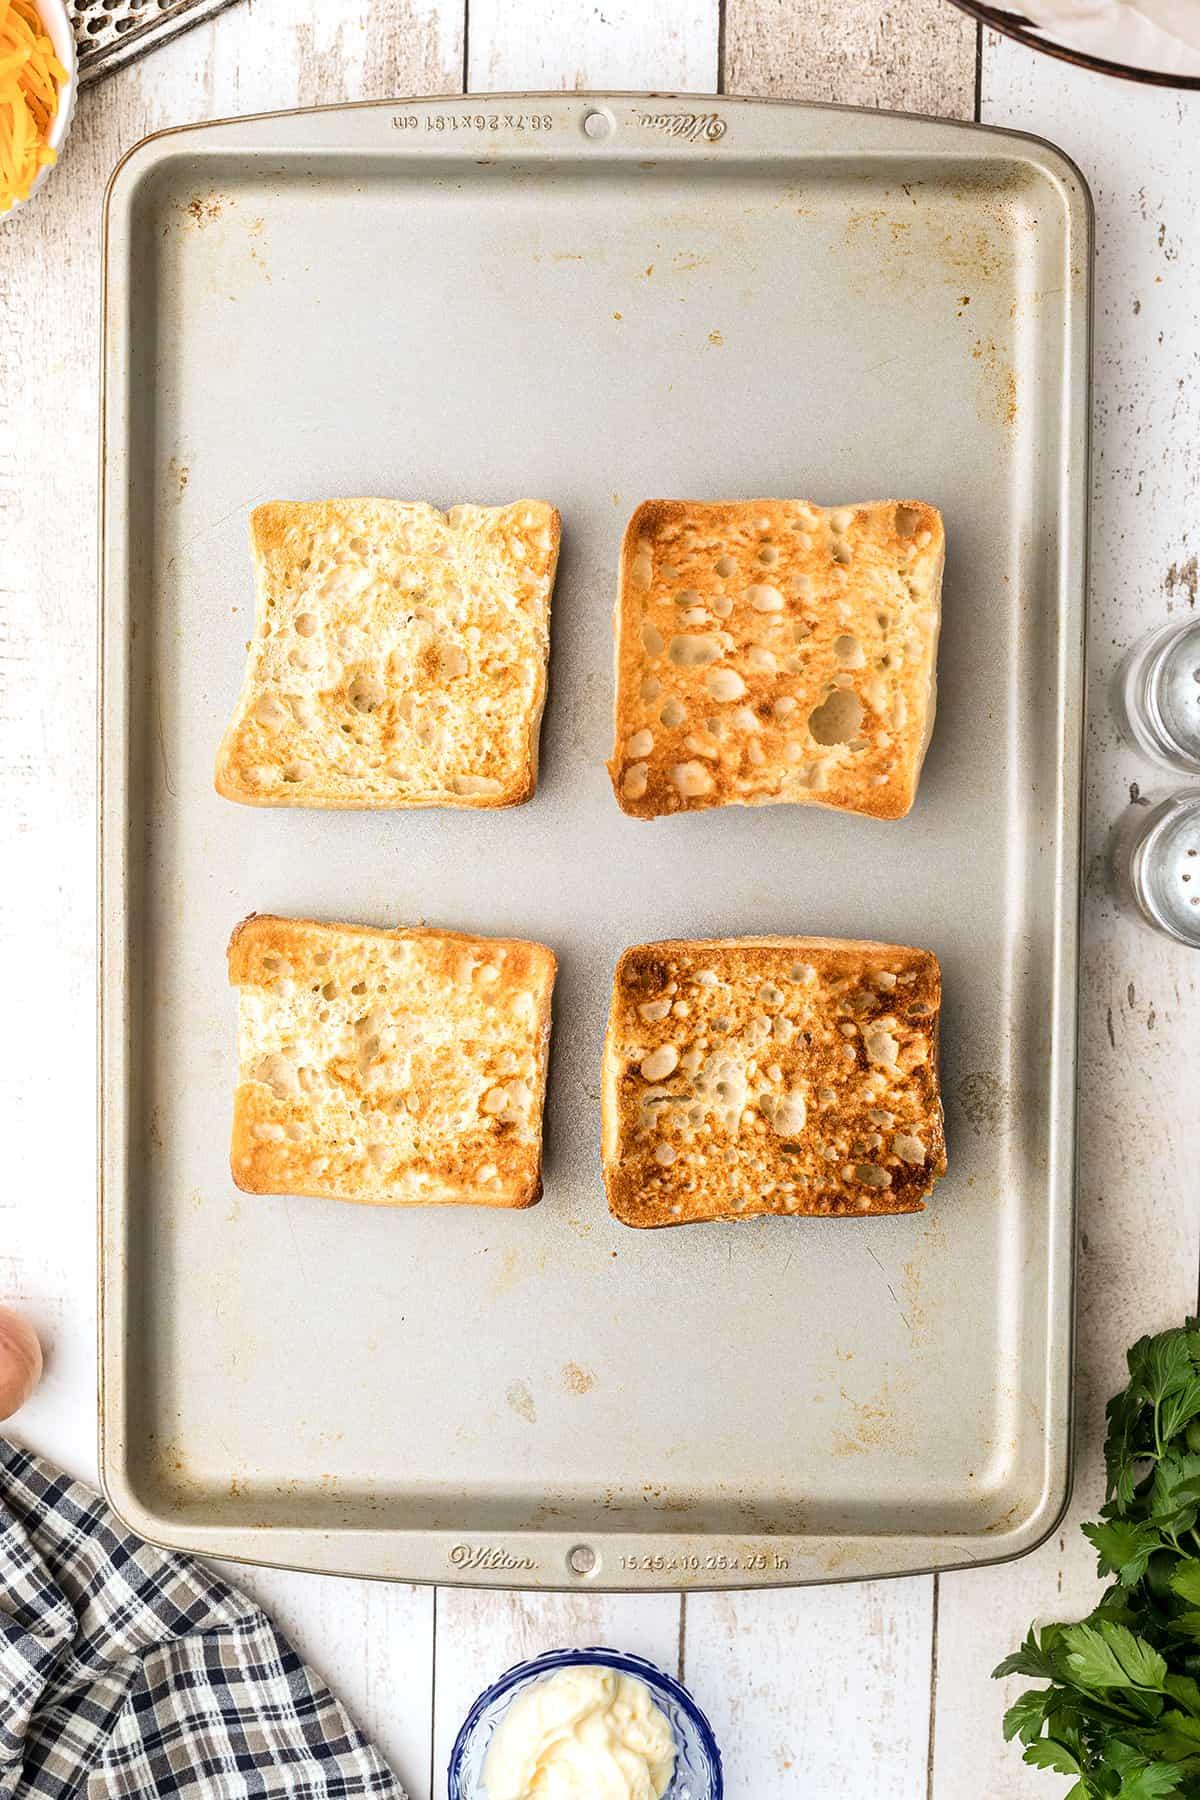 Toasted ciabatta rolls on a baking sheet.